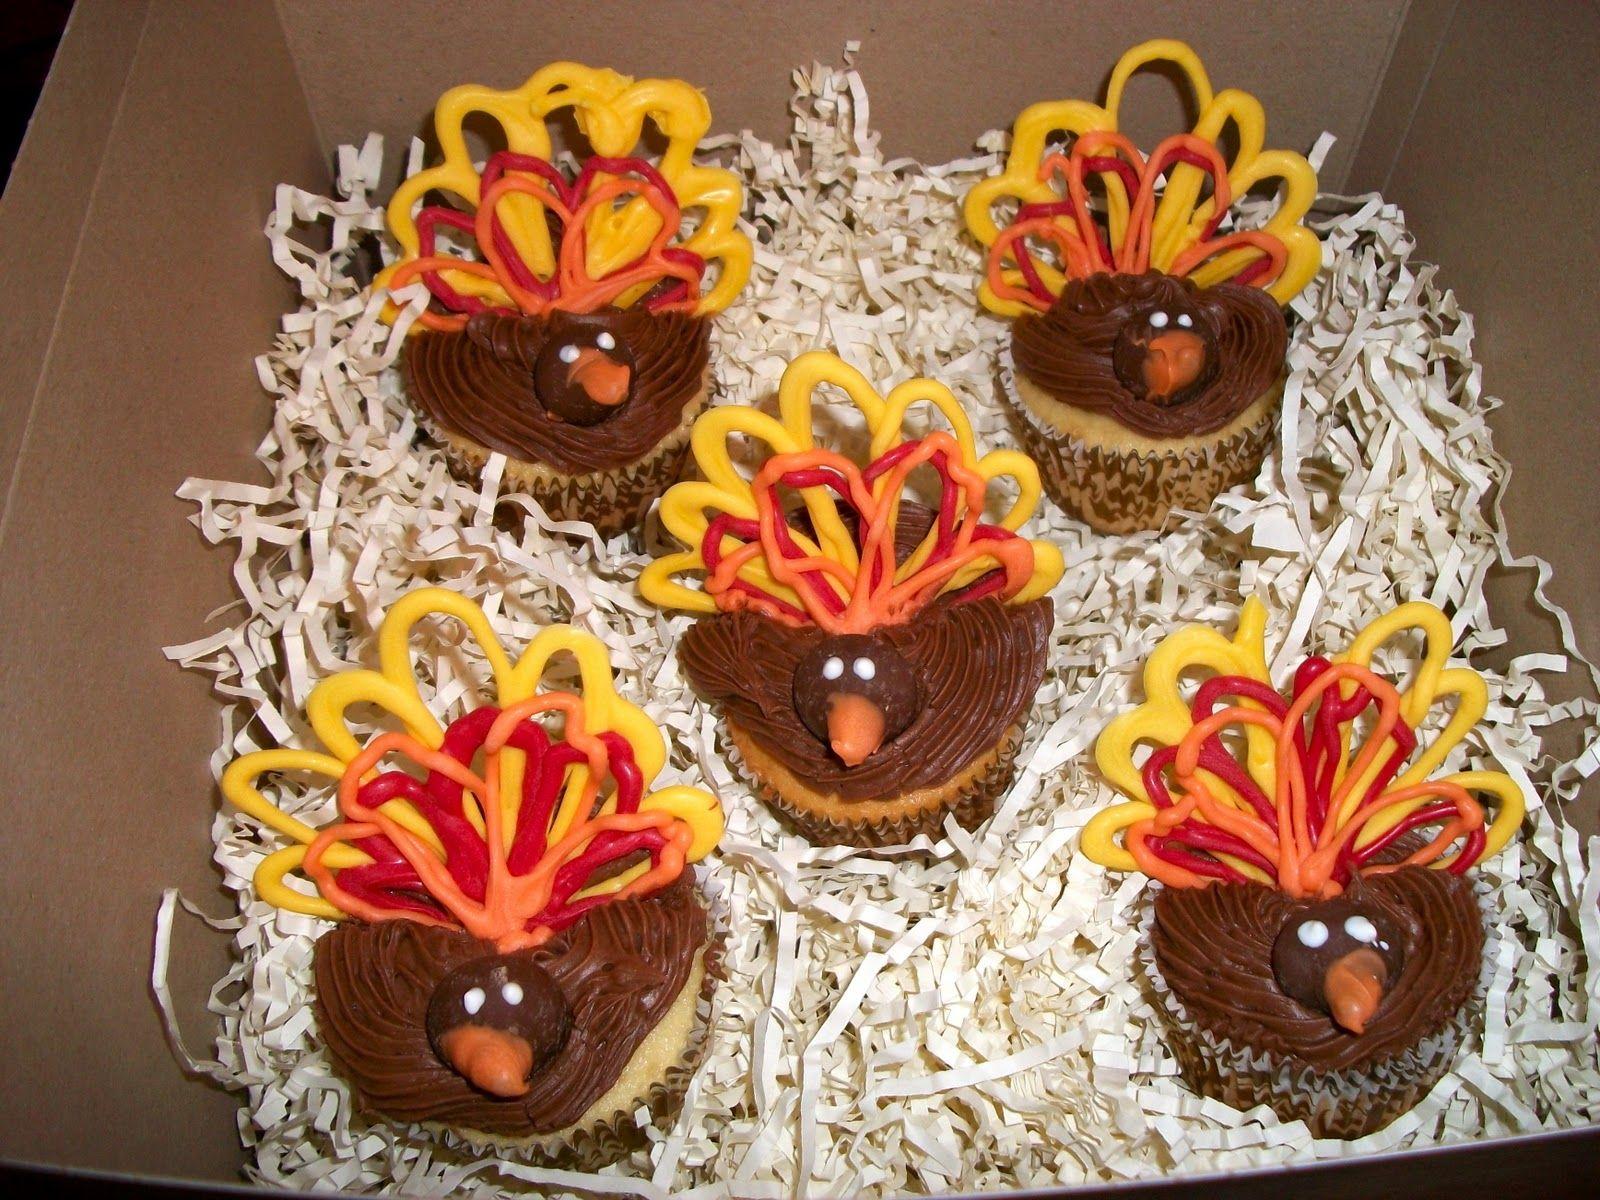 Thanksgiving cupcakes party ideas pinterest for Decorations for thanksgiving cupcakes